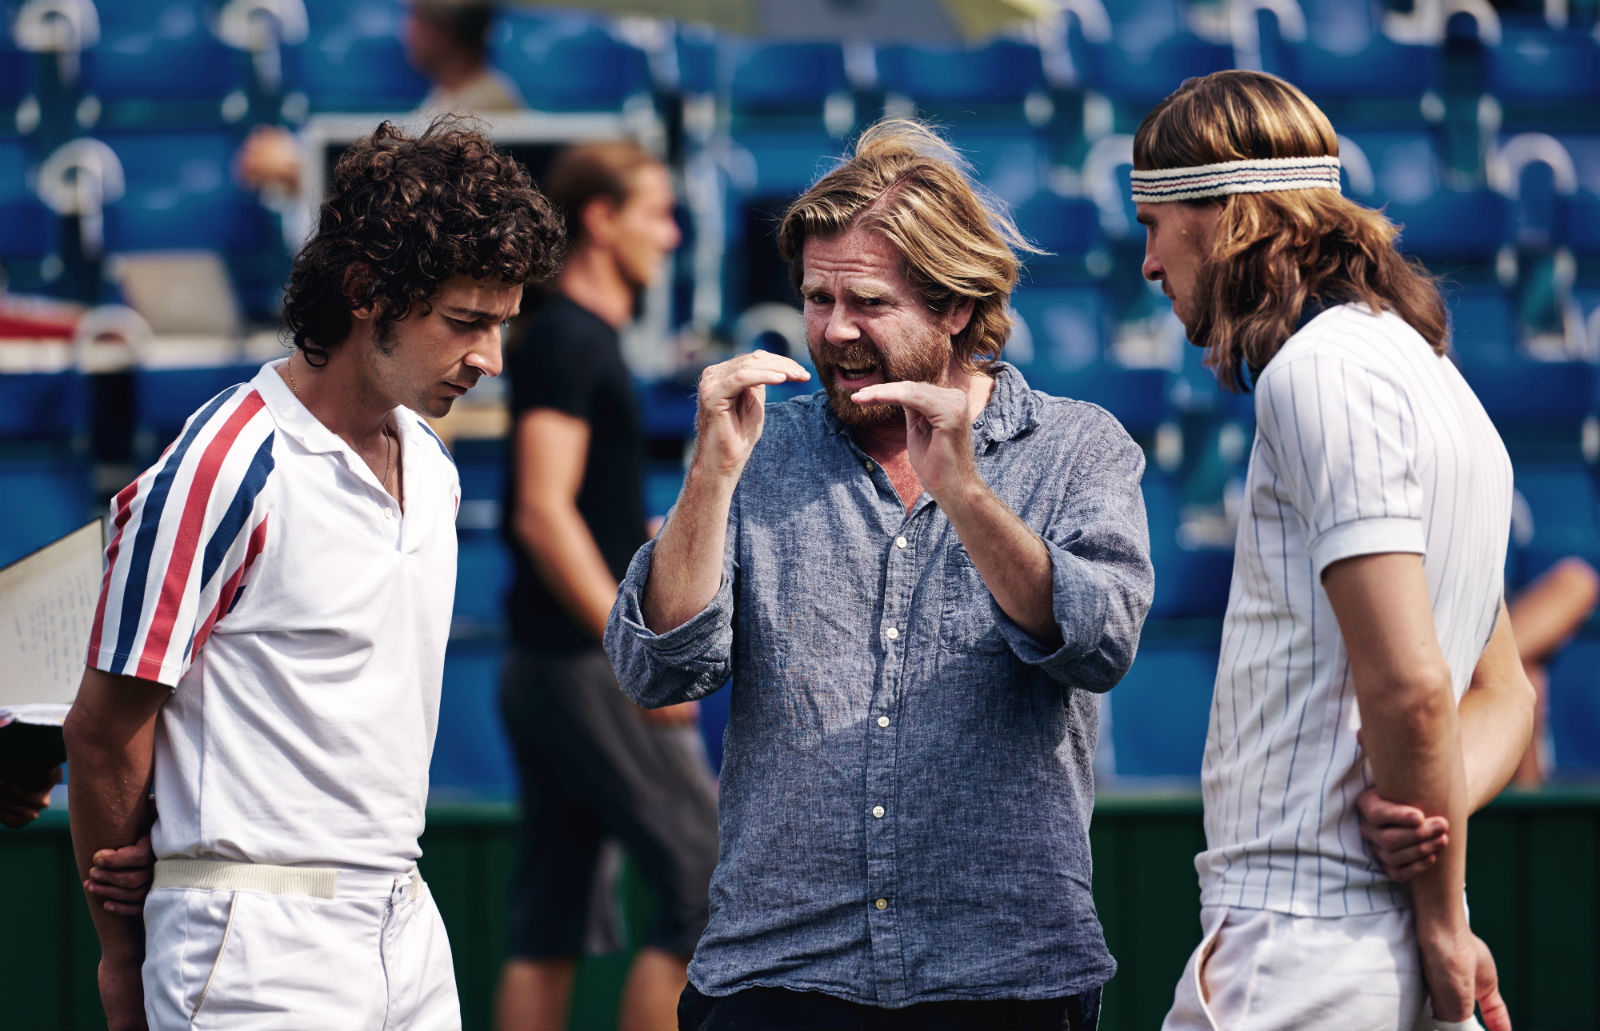 Shia LeBeouf, director Janus Metz, and Sverrir Gudnason on the set of Borg vs McEnroe.